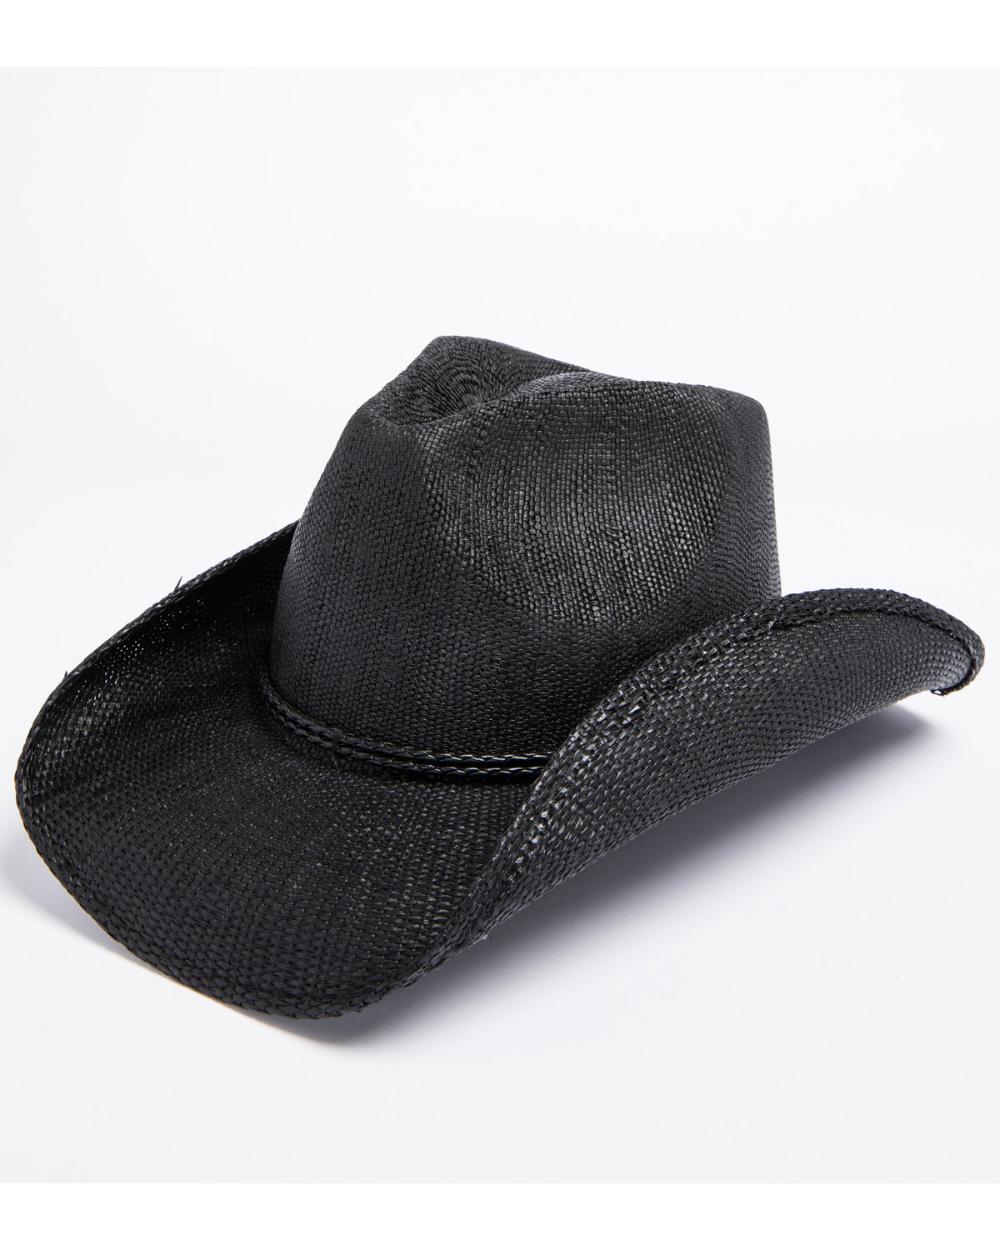 Cody James Youth Boys Black Cowboy Hat Black Cowboy Hat Cowboy Hats Black Cowboys